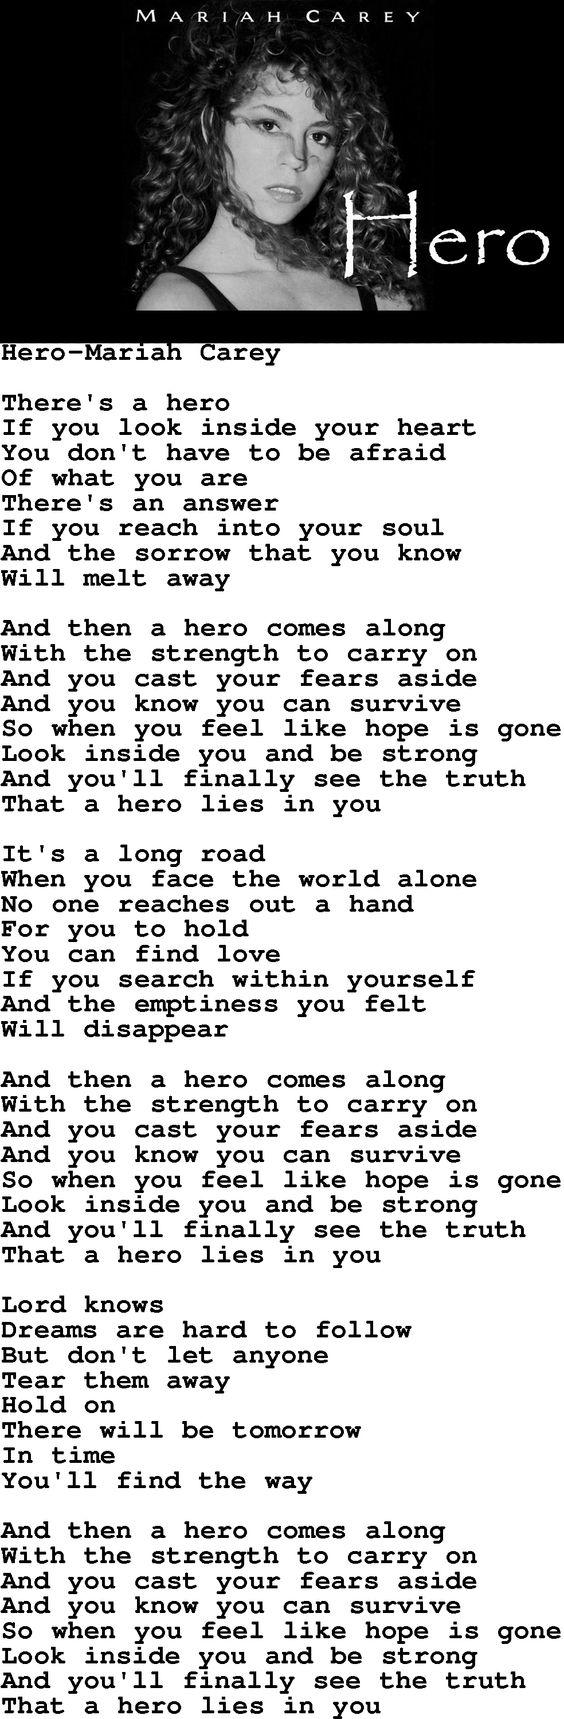 Mariah Carey - Hero #lyrics #strength #quote | Words to ... Mariah Carey Hero